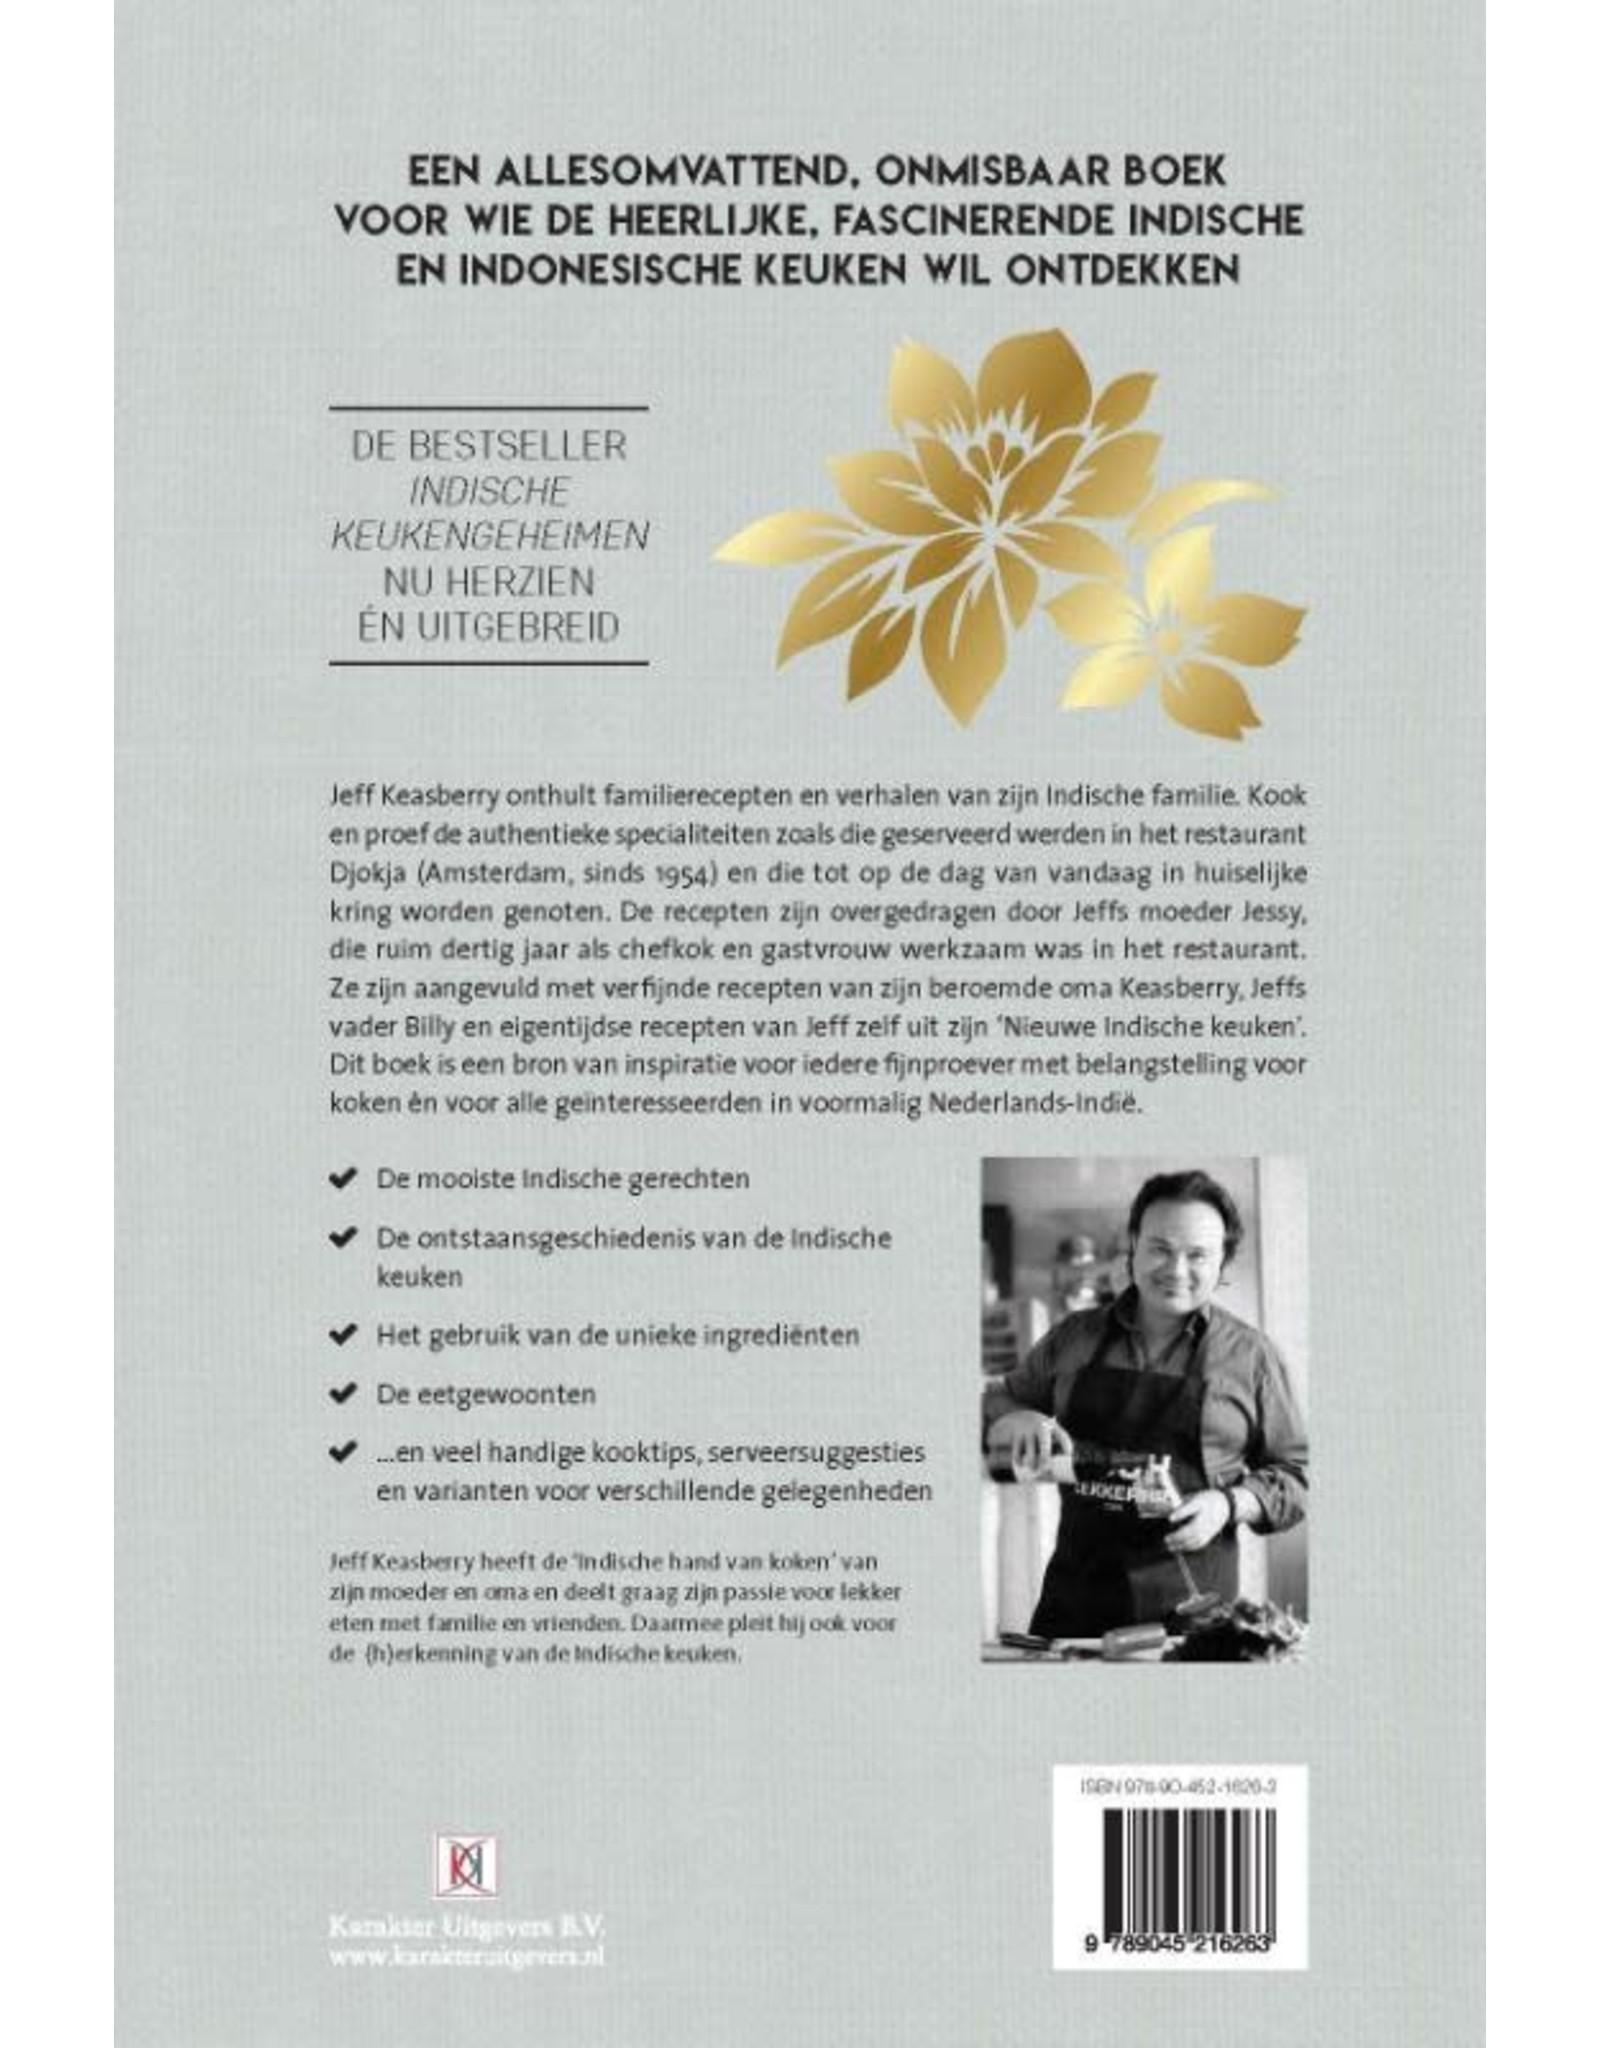 Jeff Keasberry Alle Indische Keukengeheimen